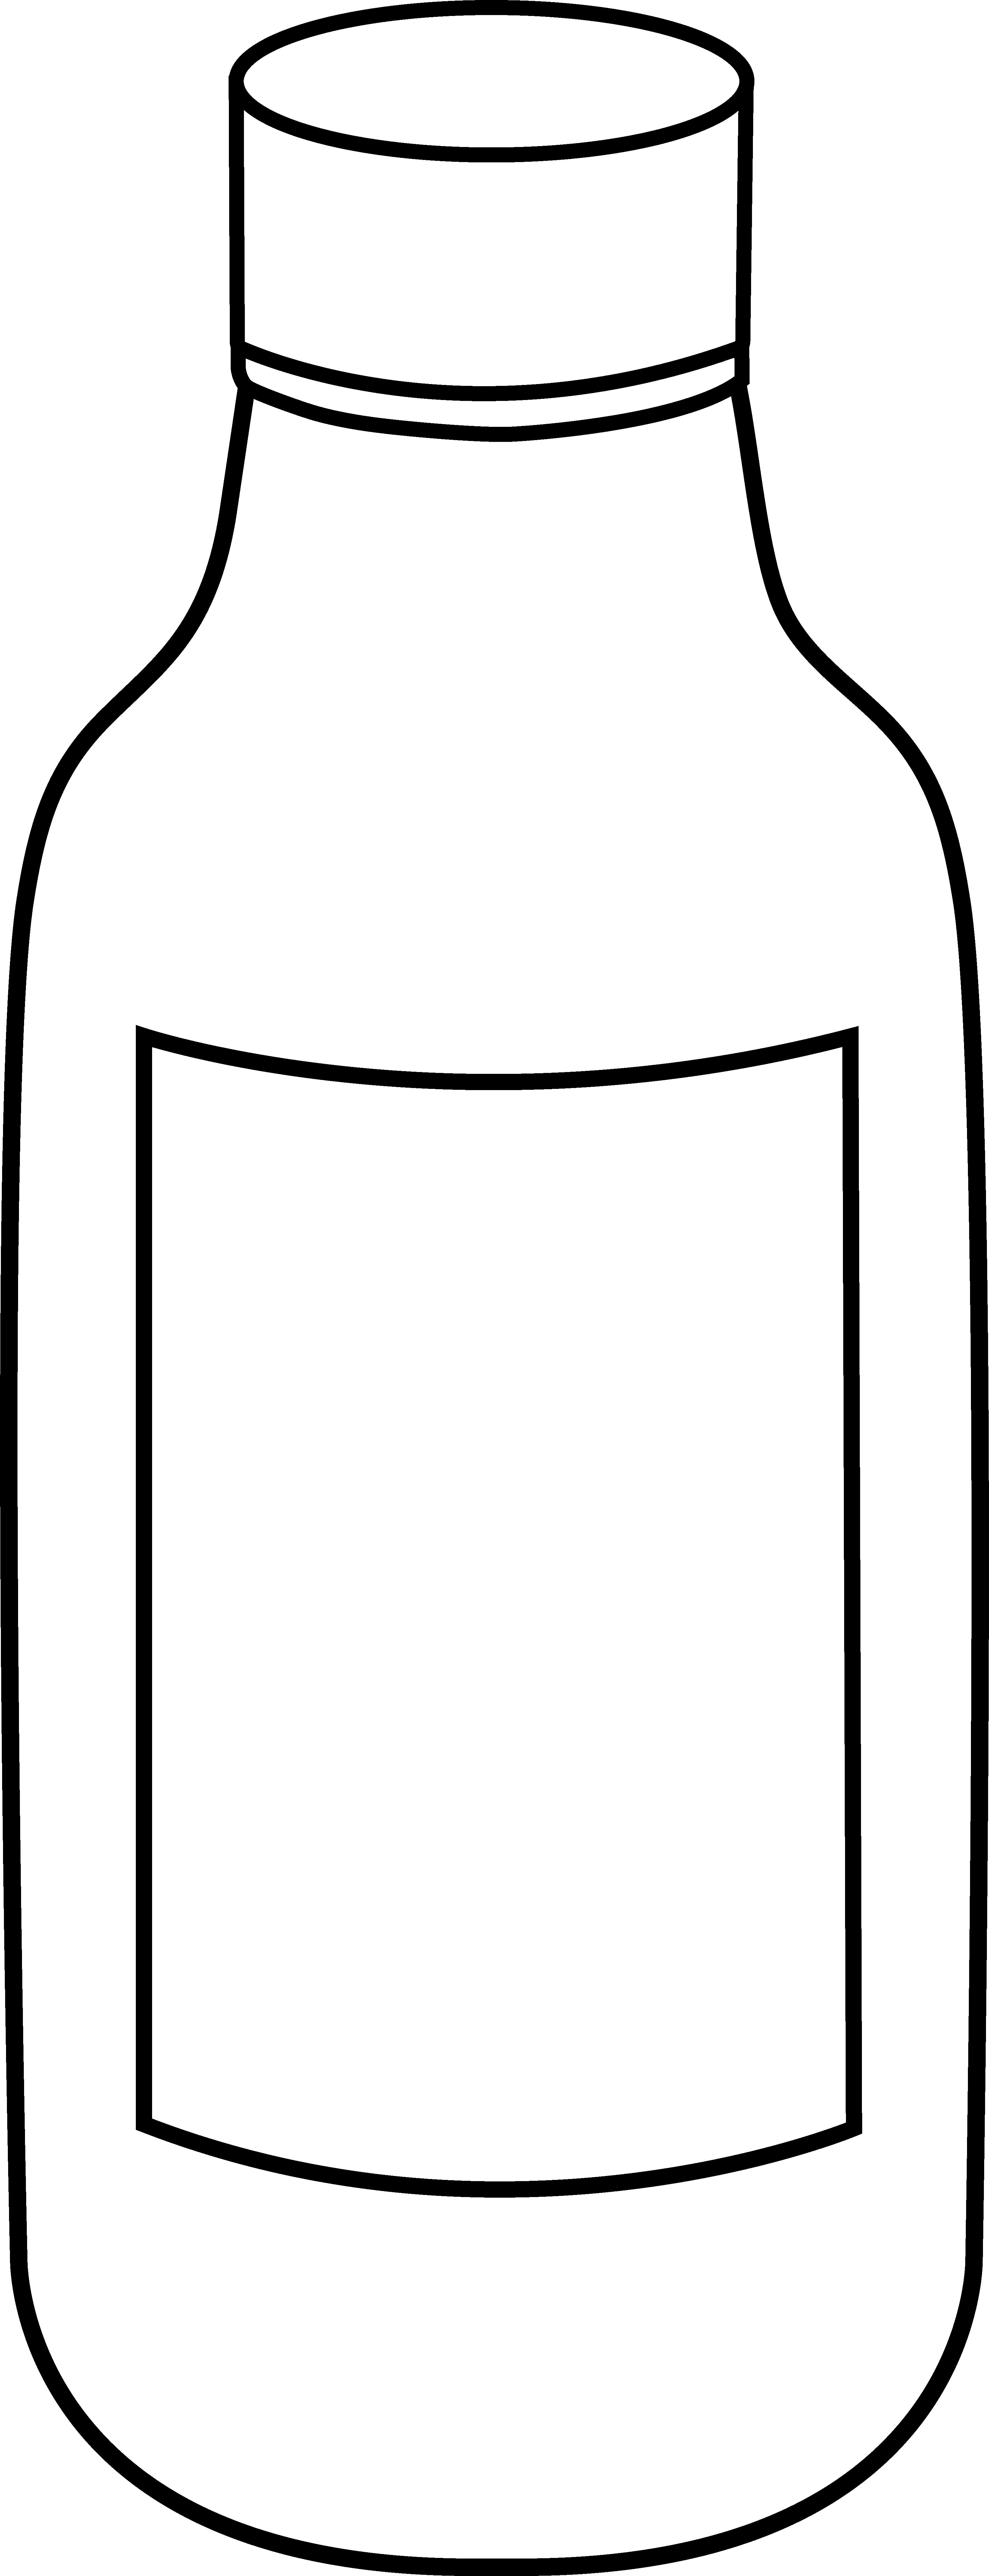 Line Art Jug : Cartoon medicine bottle cliparts